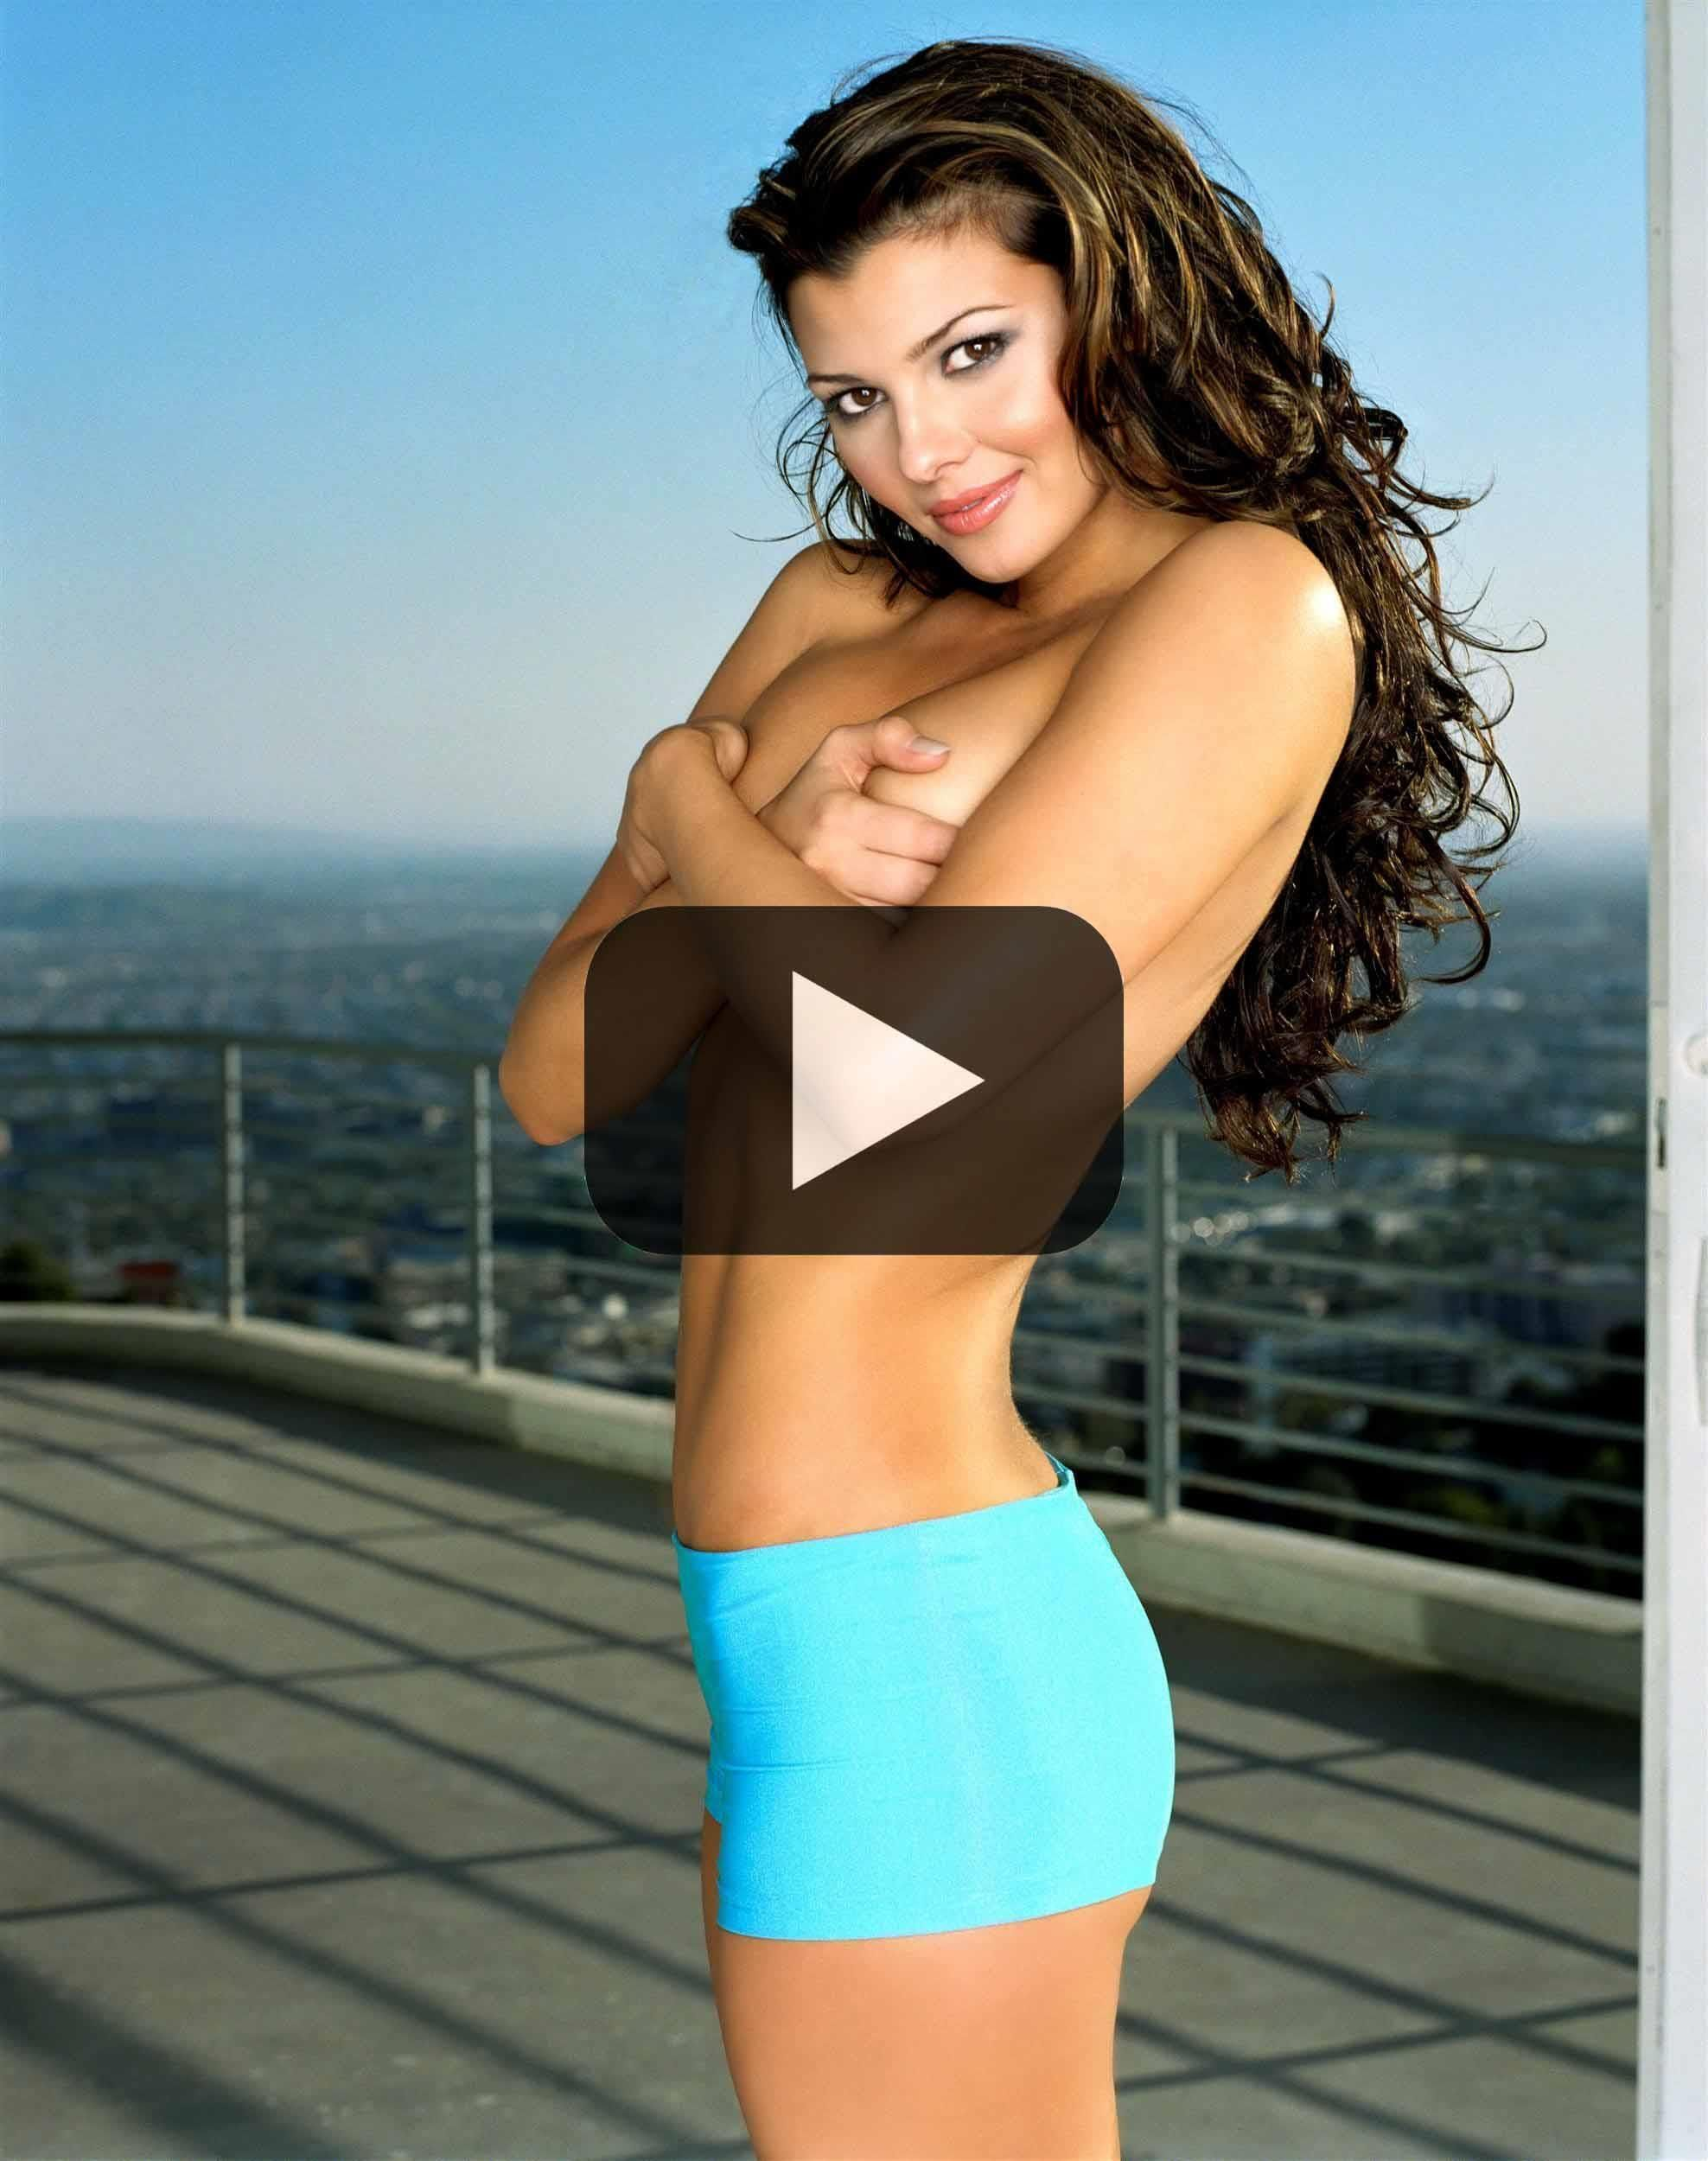 naomi-wang-porn-videos-anal-peeing